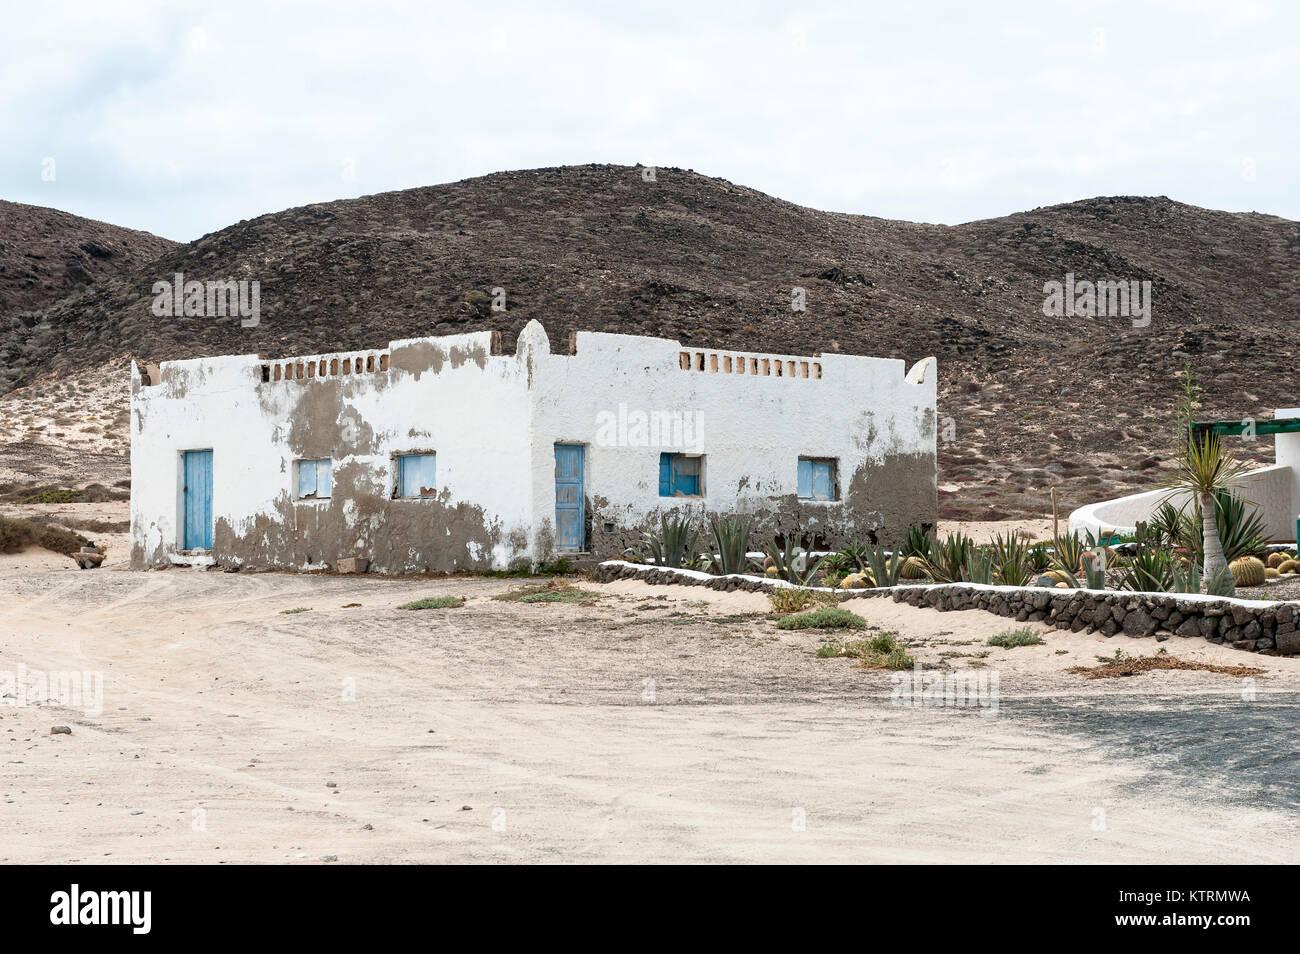 Haus in Casas de Pedro Barba, La Graciosa, Chinijo Archipel, Kanarische Inseln, Spanien Stockbild